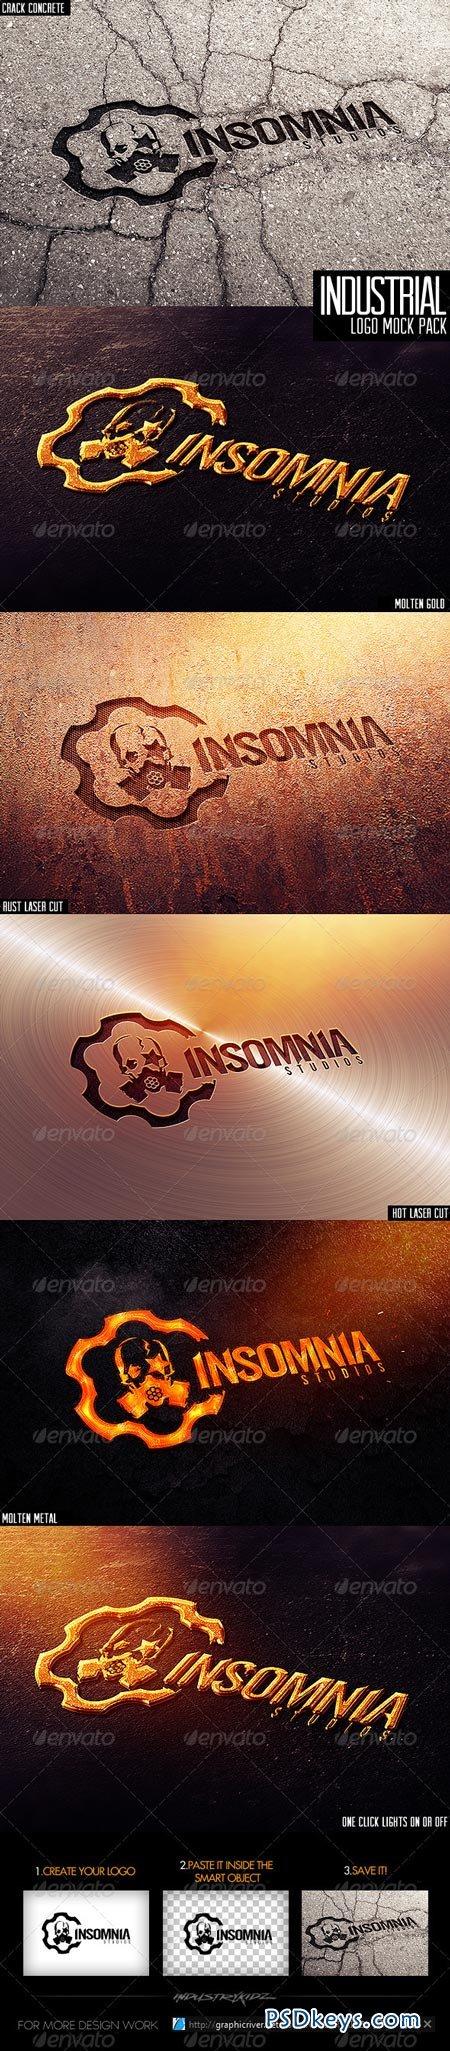 Industrial Photorealistic Logo Mock-Up 3726032